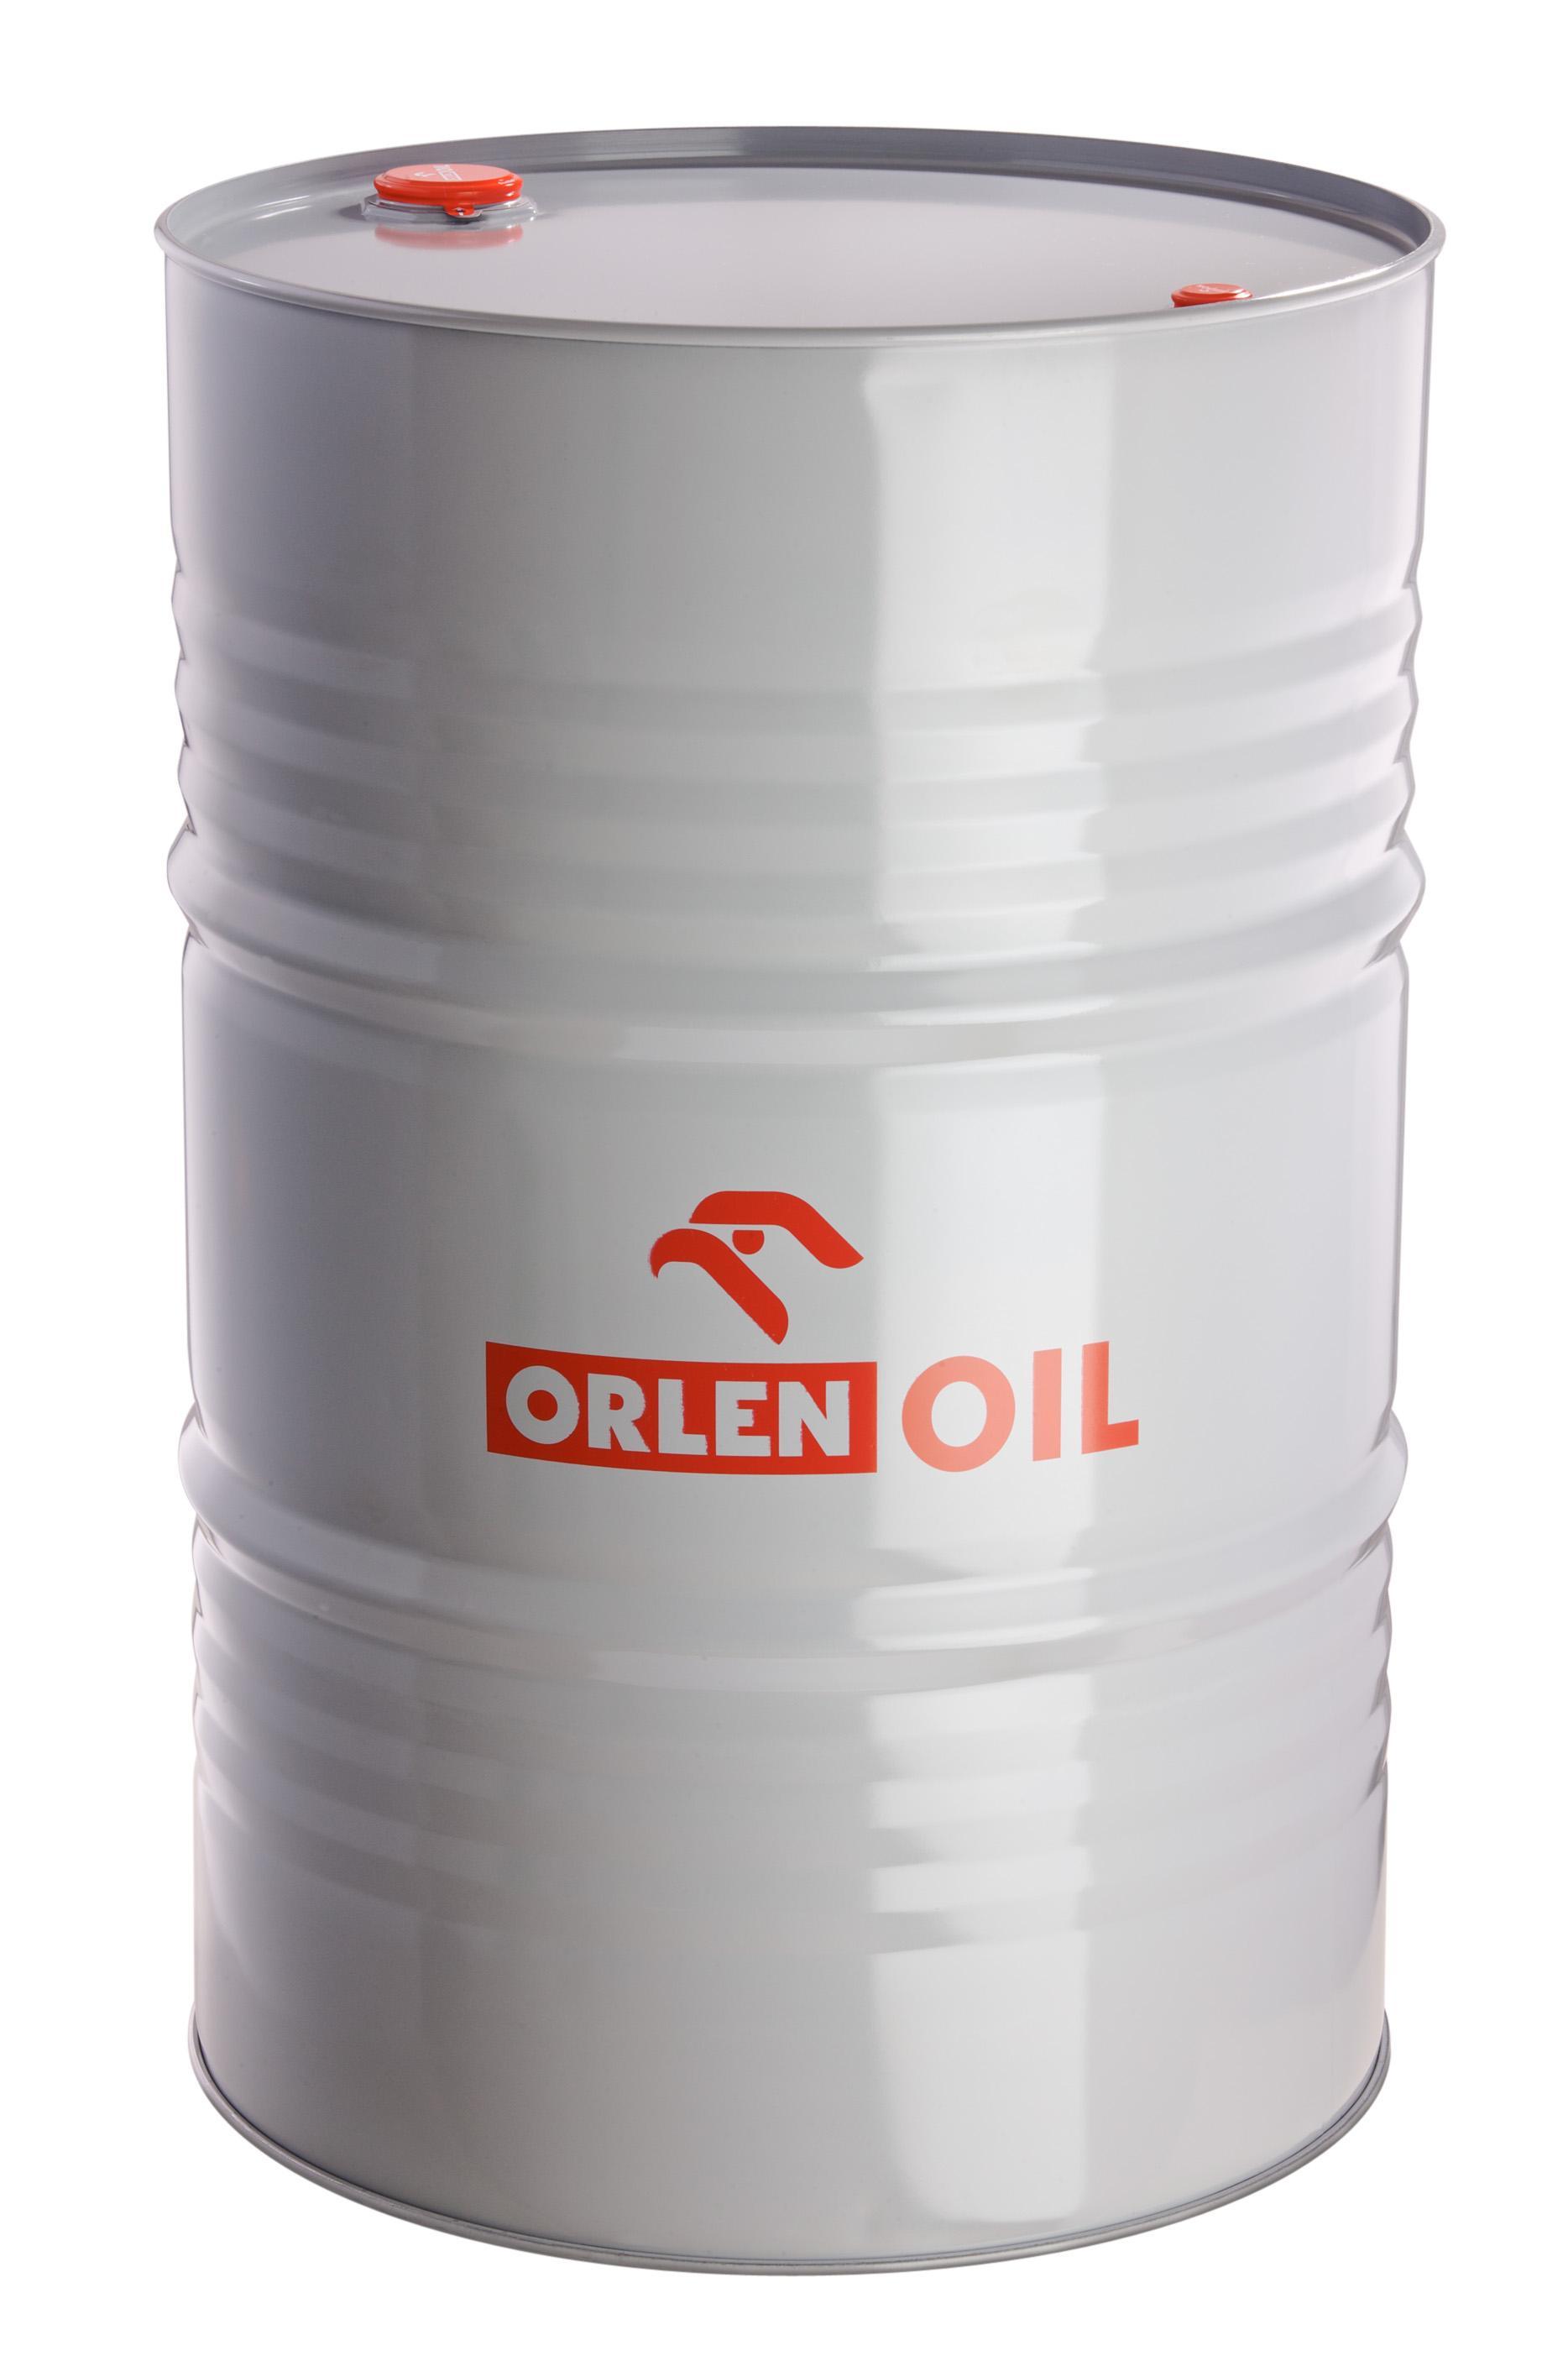 ORLEN OIL TRANSGEAR PE 460   BECZKA 205L